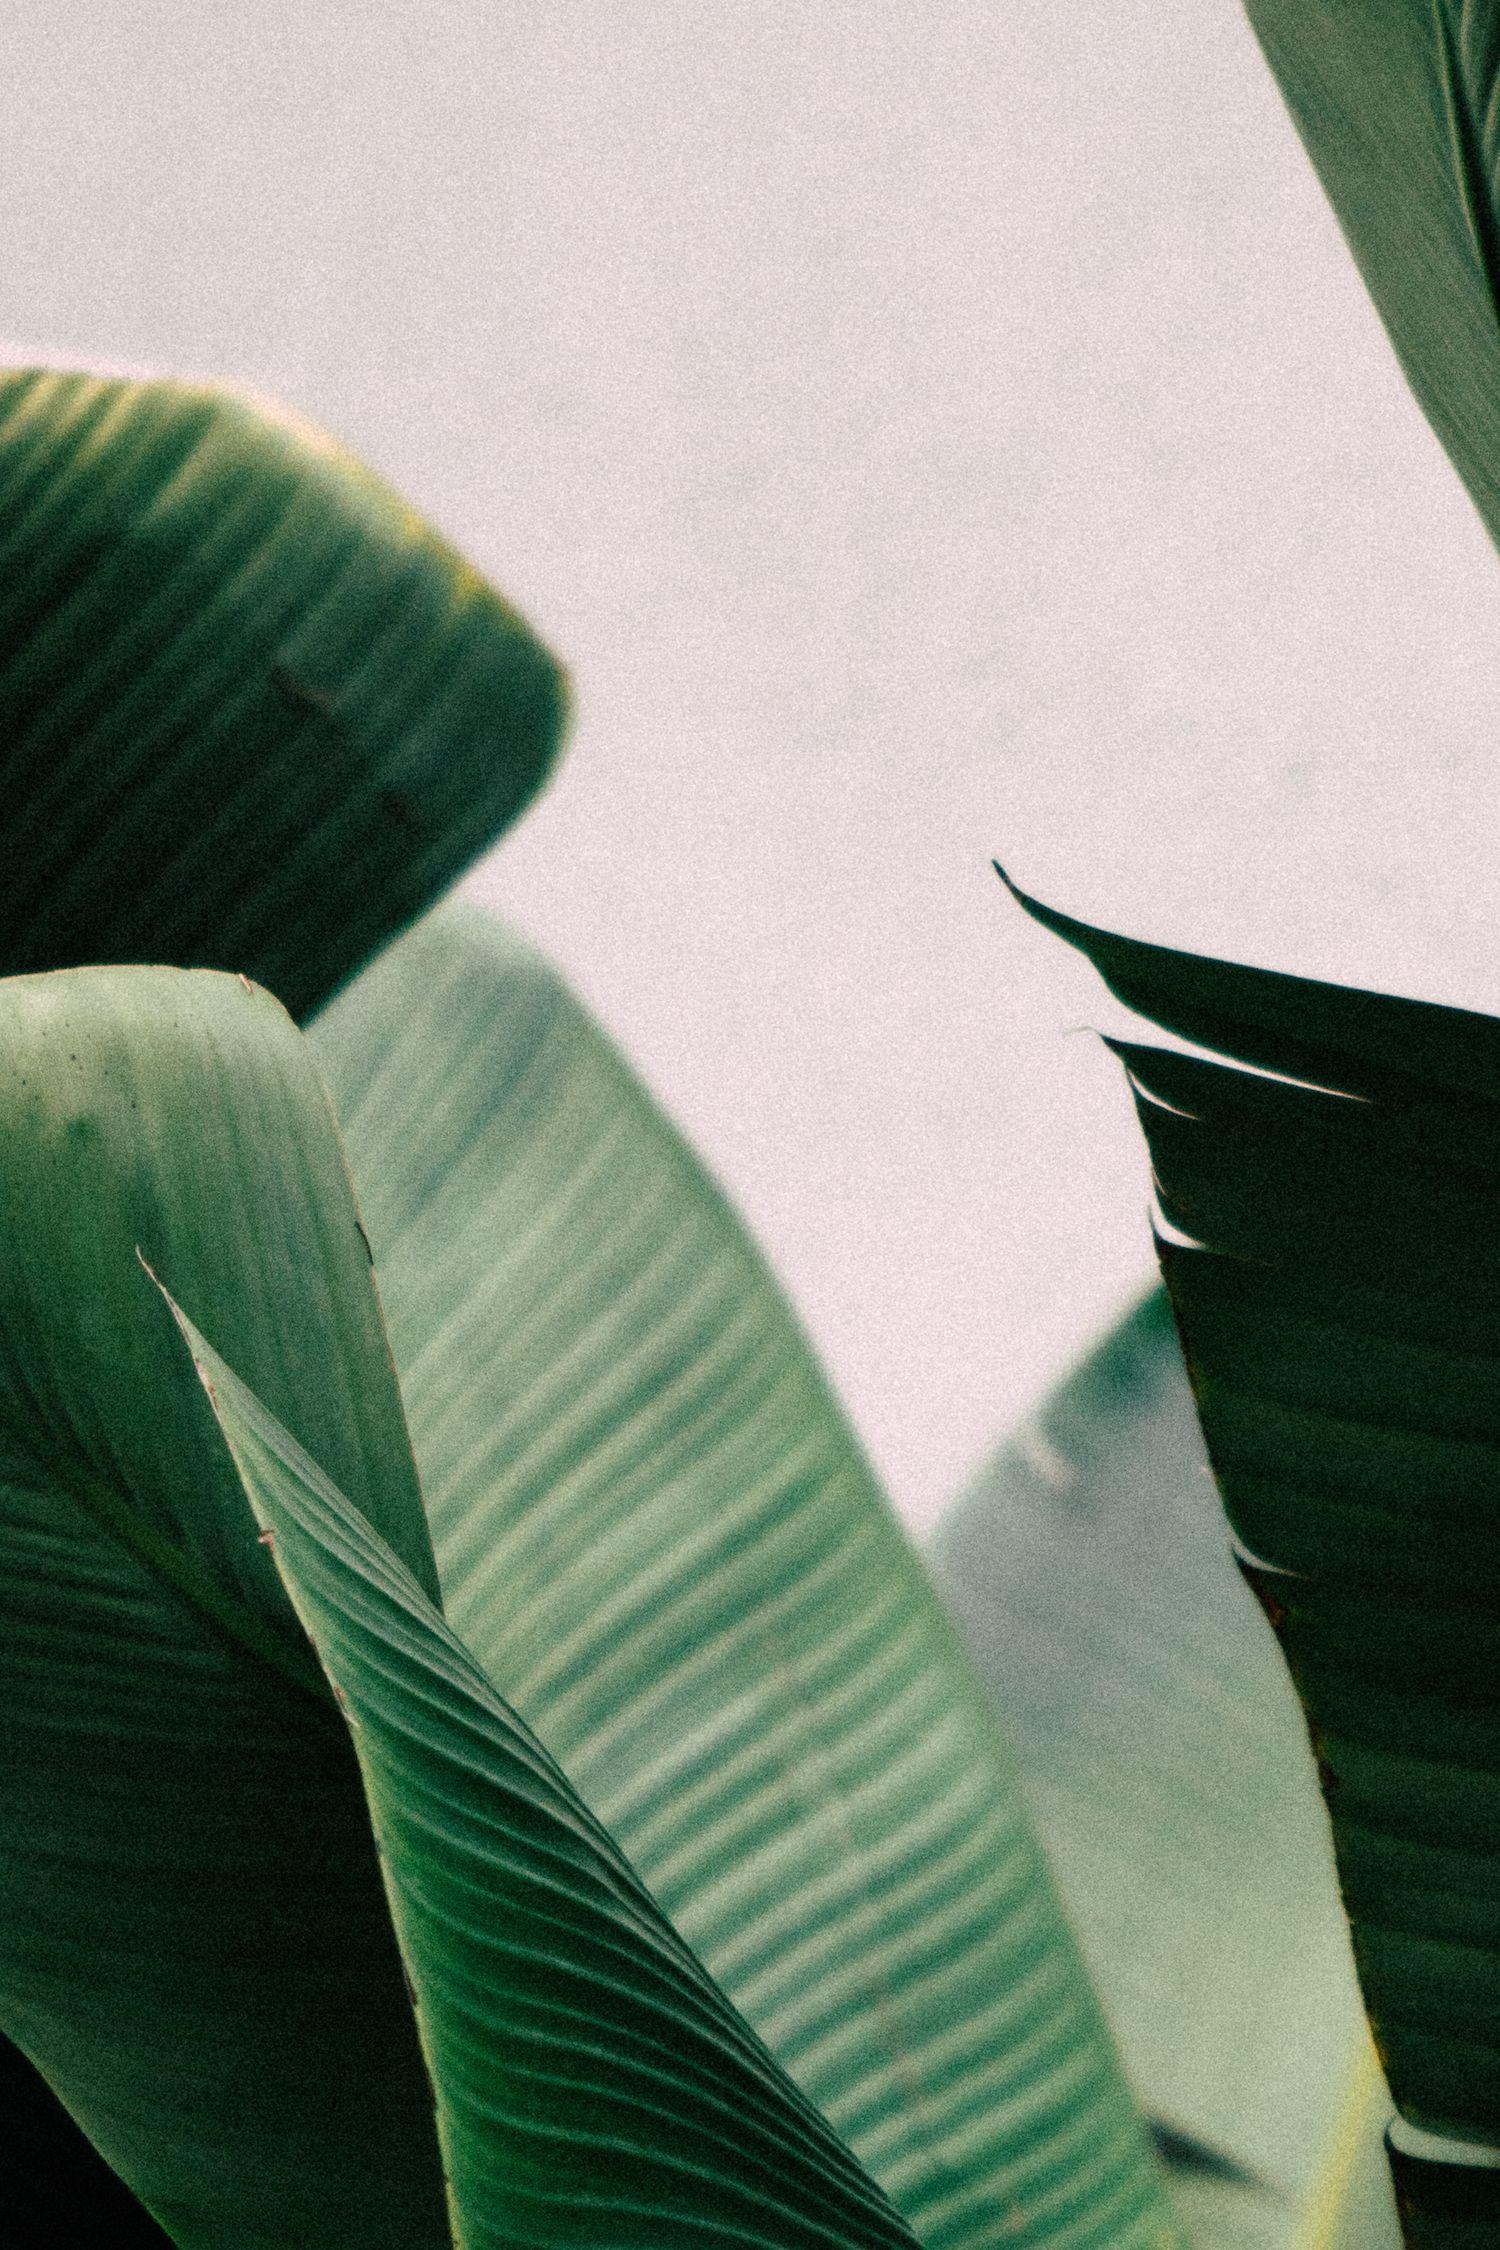 INSTANT DOWNLOAD PRINT, Minimal Palms Art Print, Palm Art Print, Nature Art Print, Palm Leaves Art Print